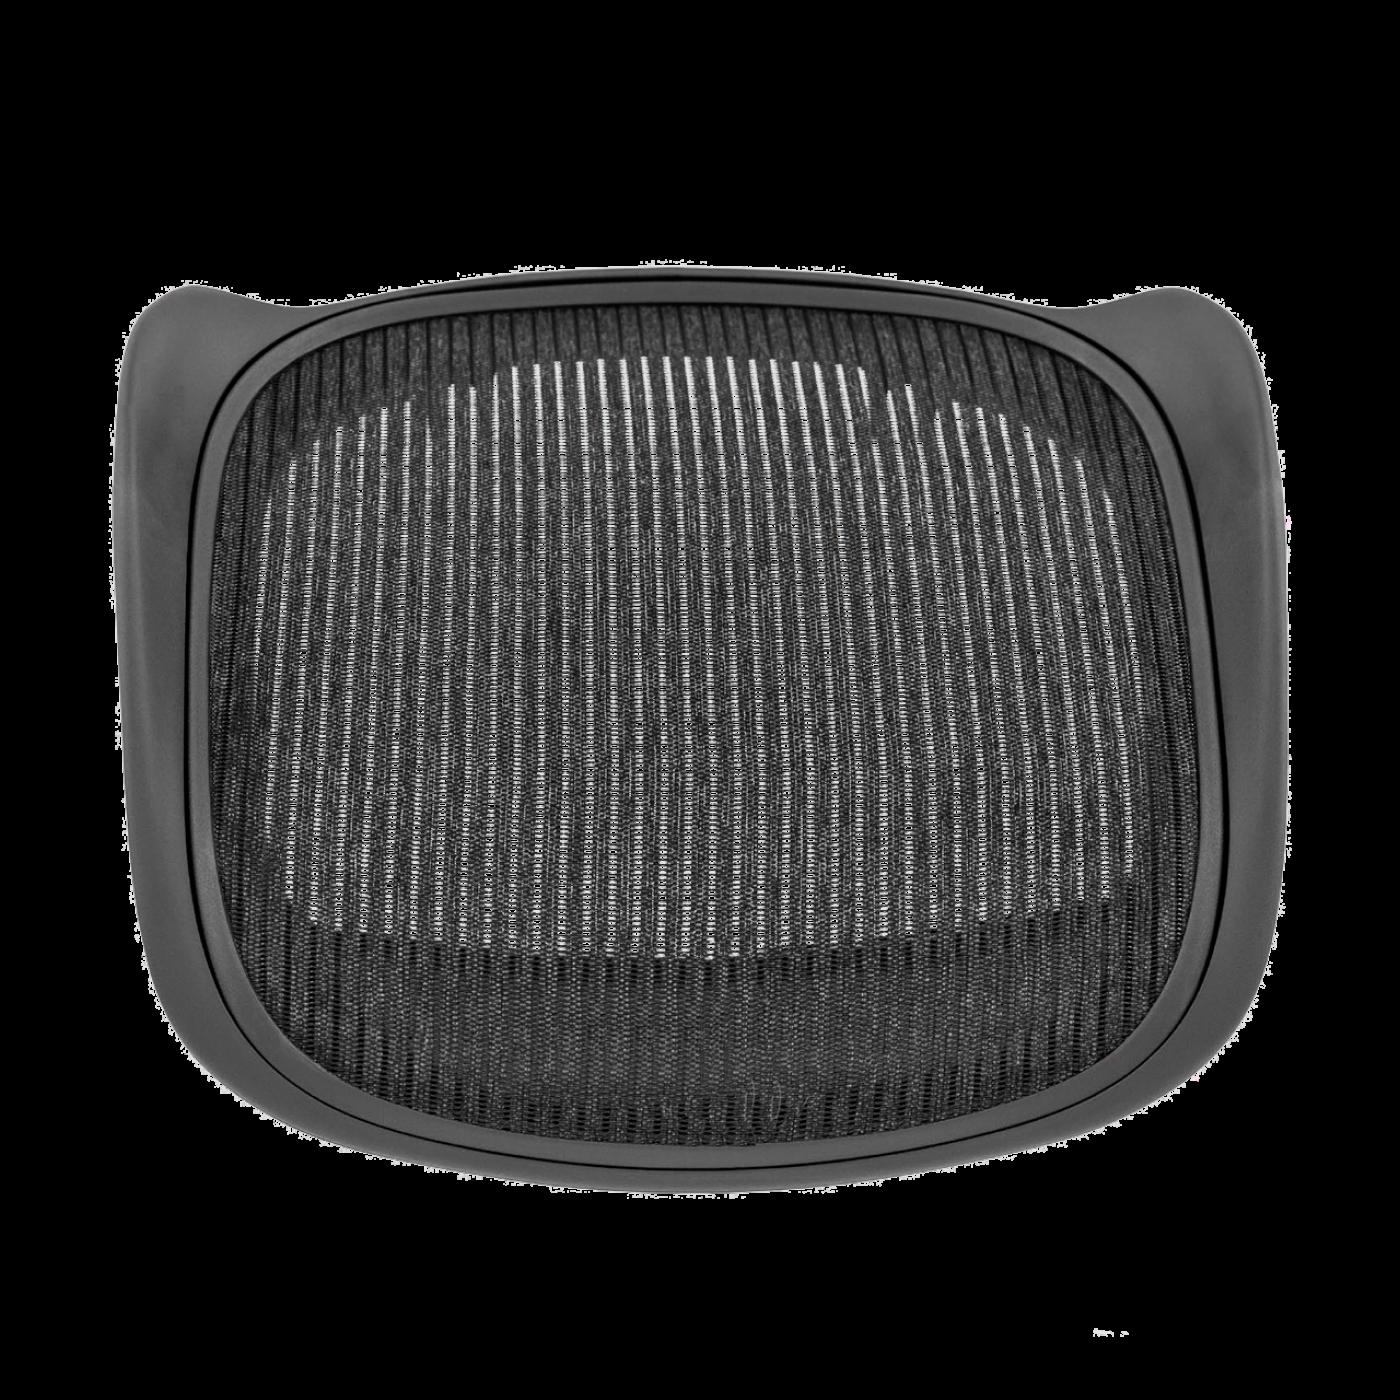 https://www.valueshop.dk/media/catalog/product/h/m/hm_aeron_seatpan_800x600_1.gif